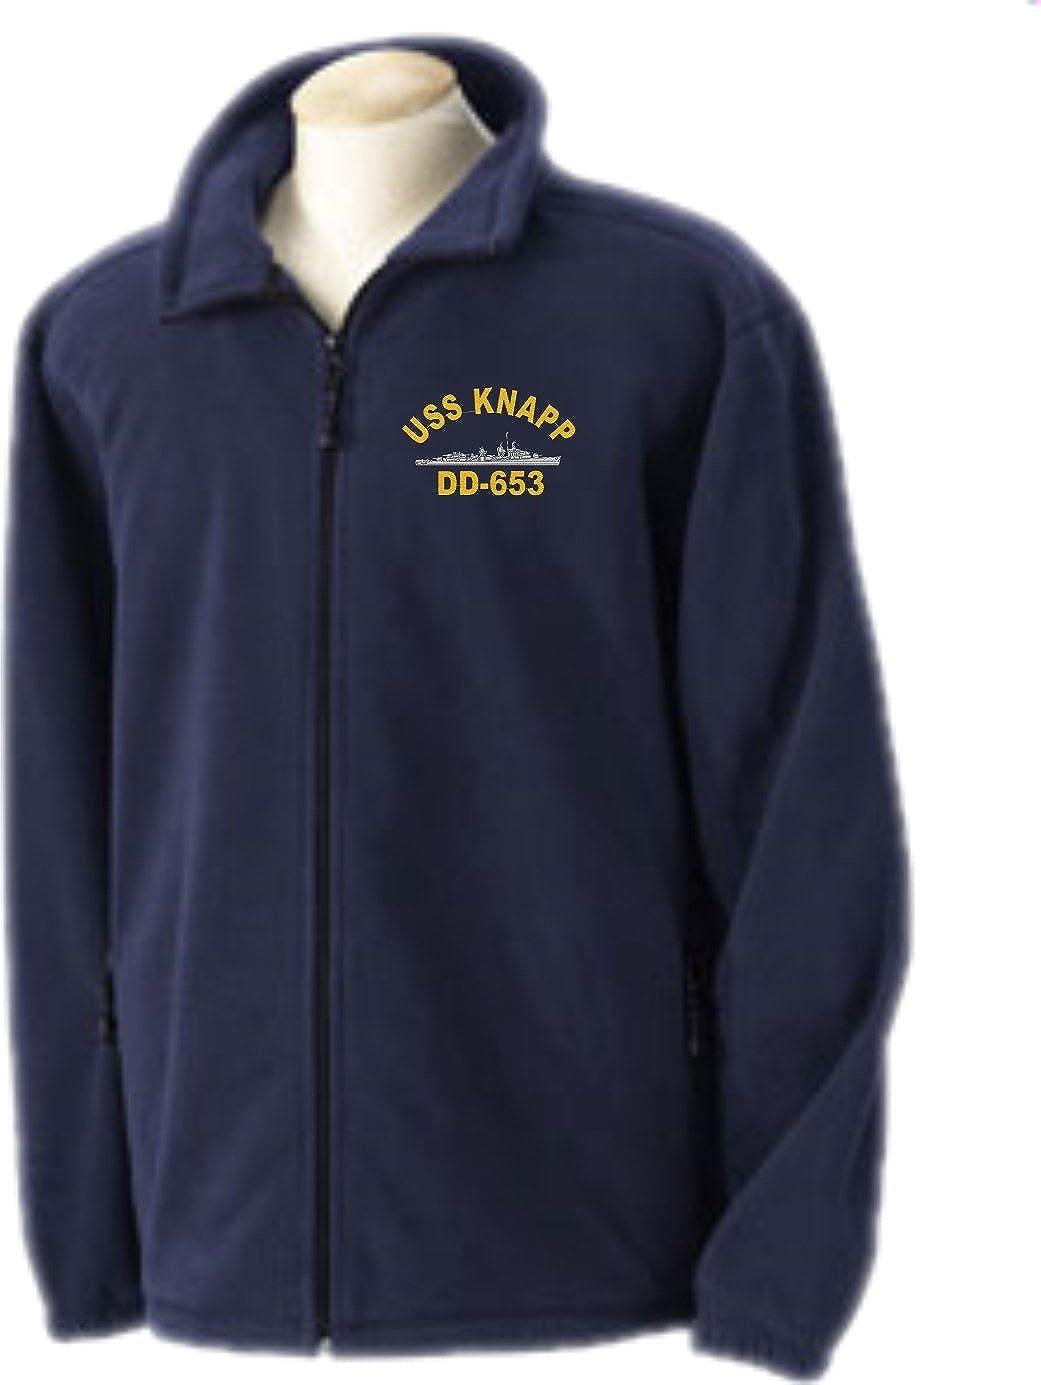 Custom Military Apparel USS Knapp DD-653 Embroidered Fleece Jacket Sizes Small-4X